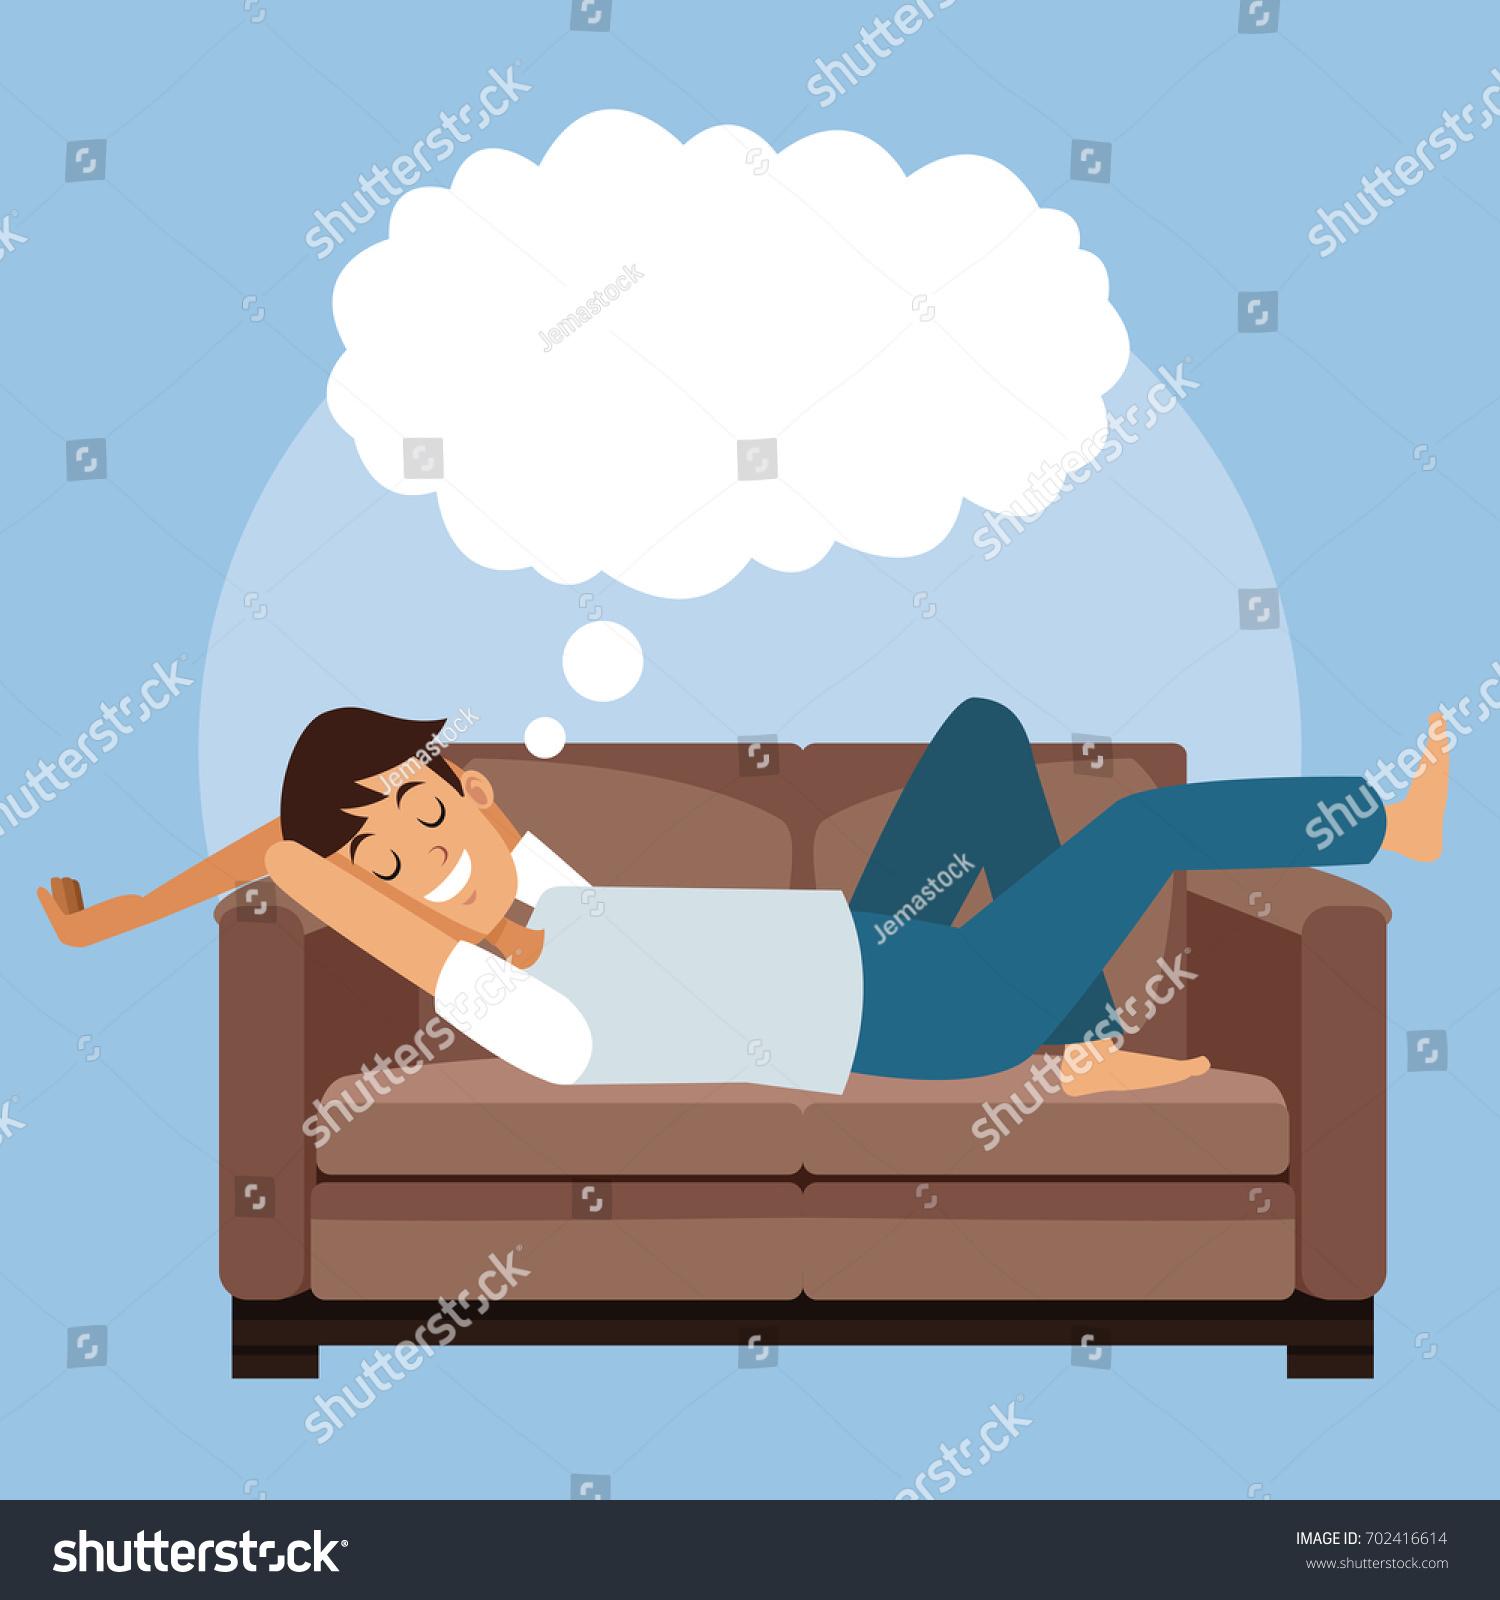 Colorful Scene Man Sleep Sofa Cloud Stock Vector